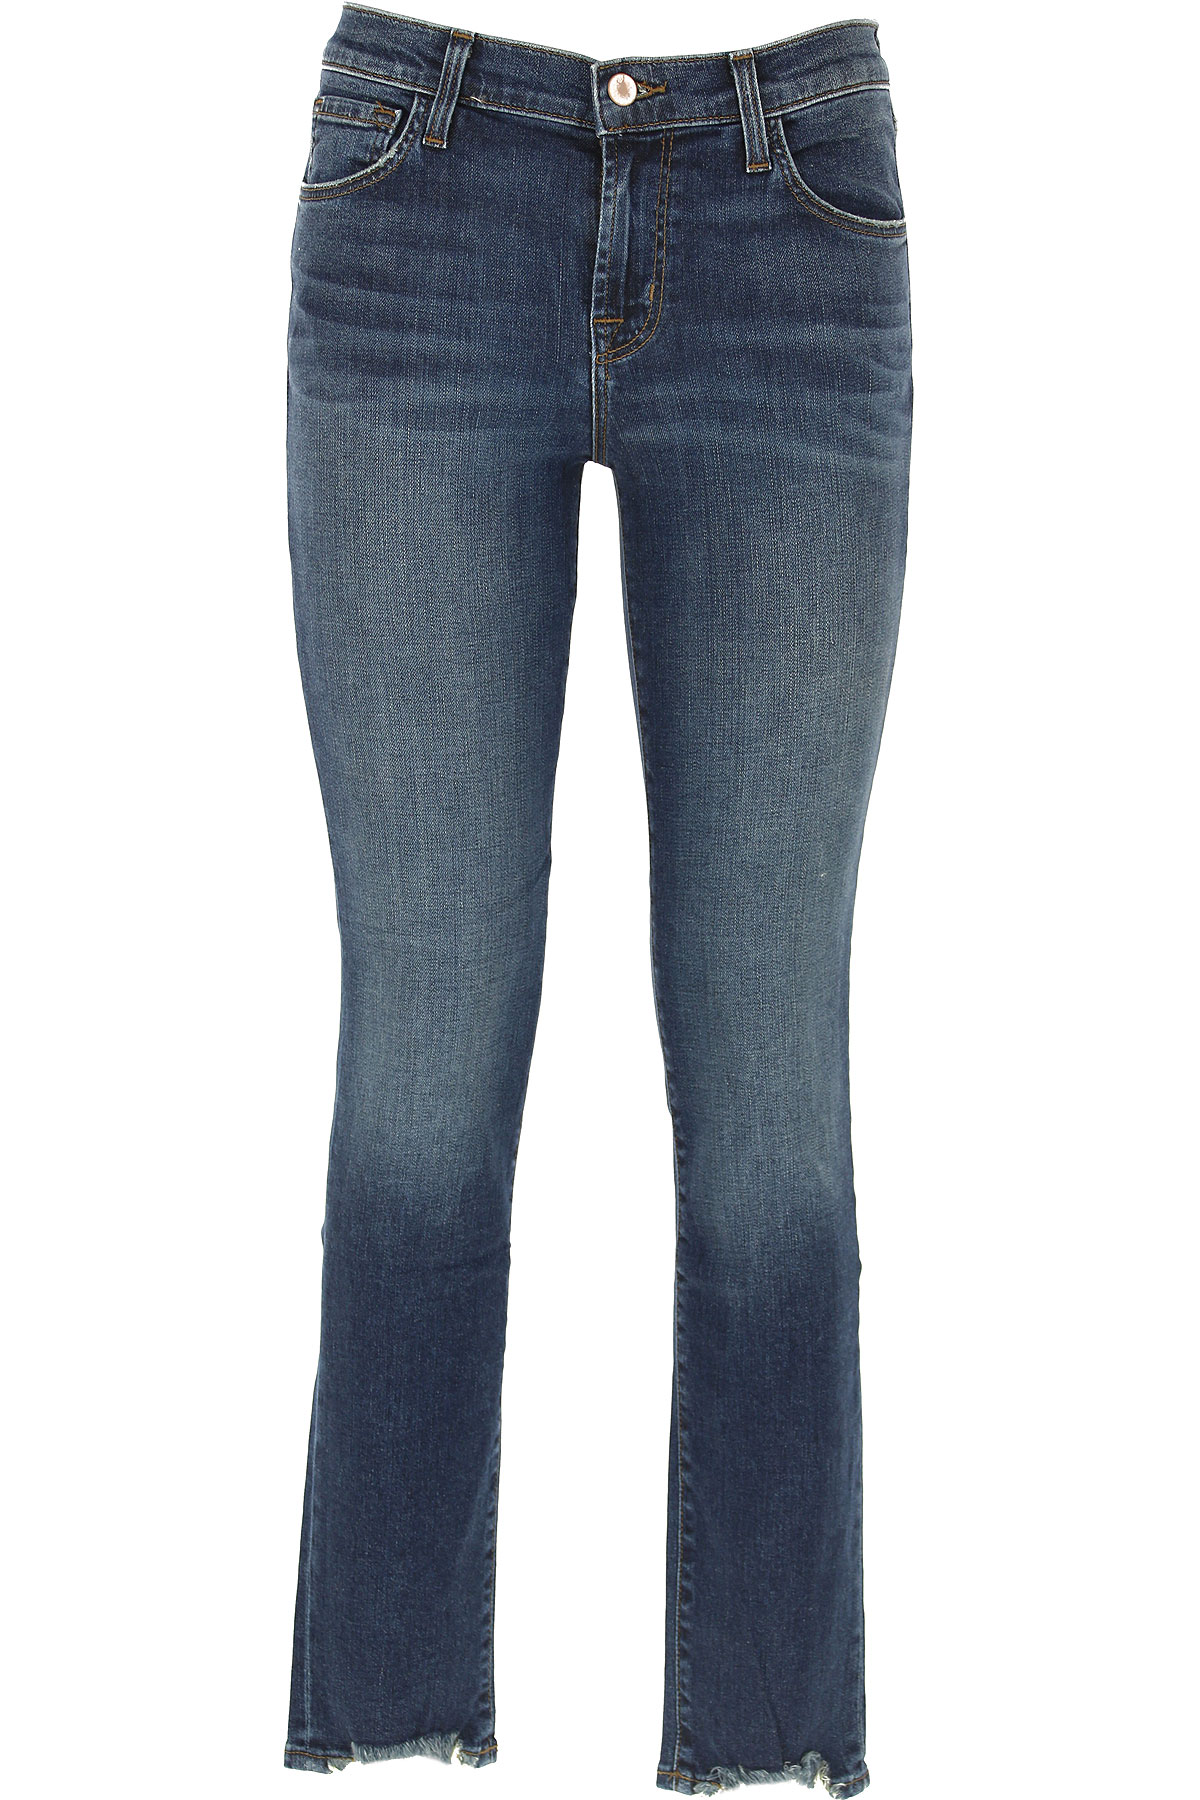 Image of J Brand Jeans, Denim Blue, Cotton, 2017, 24 25 26 27 28 29 30